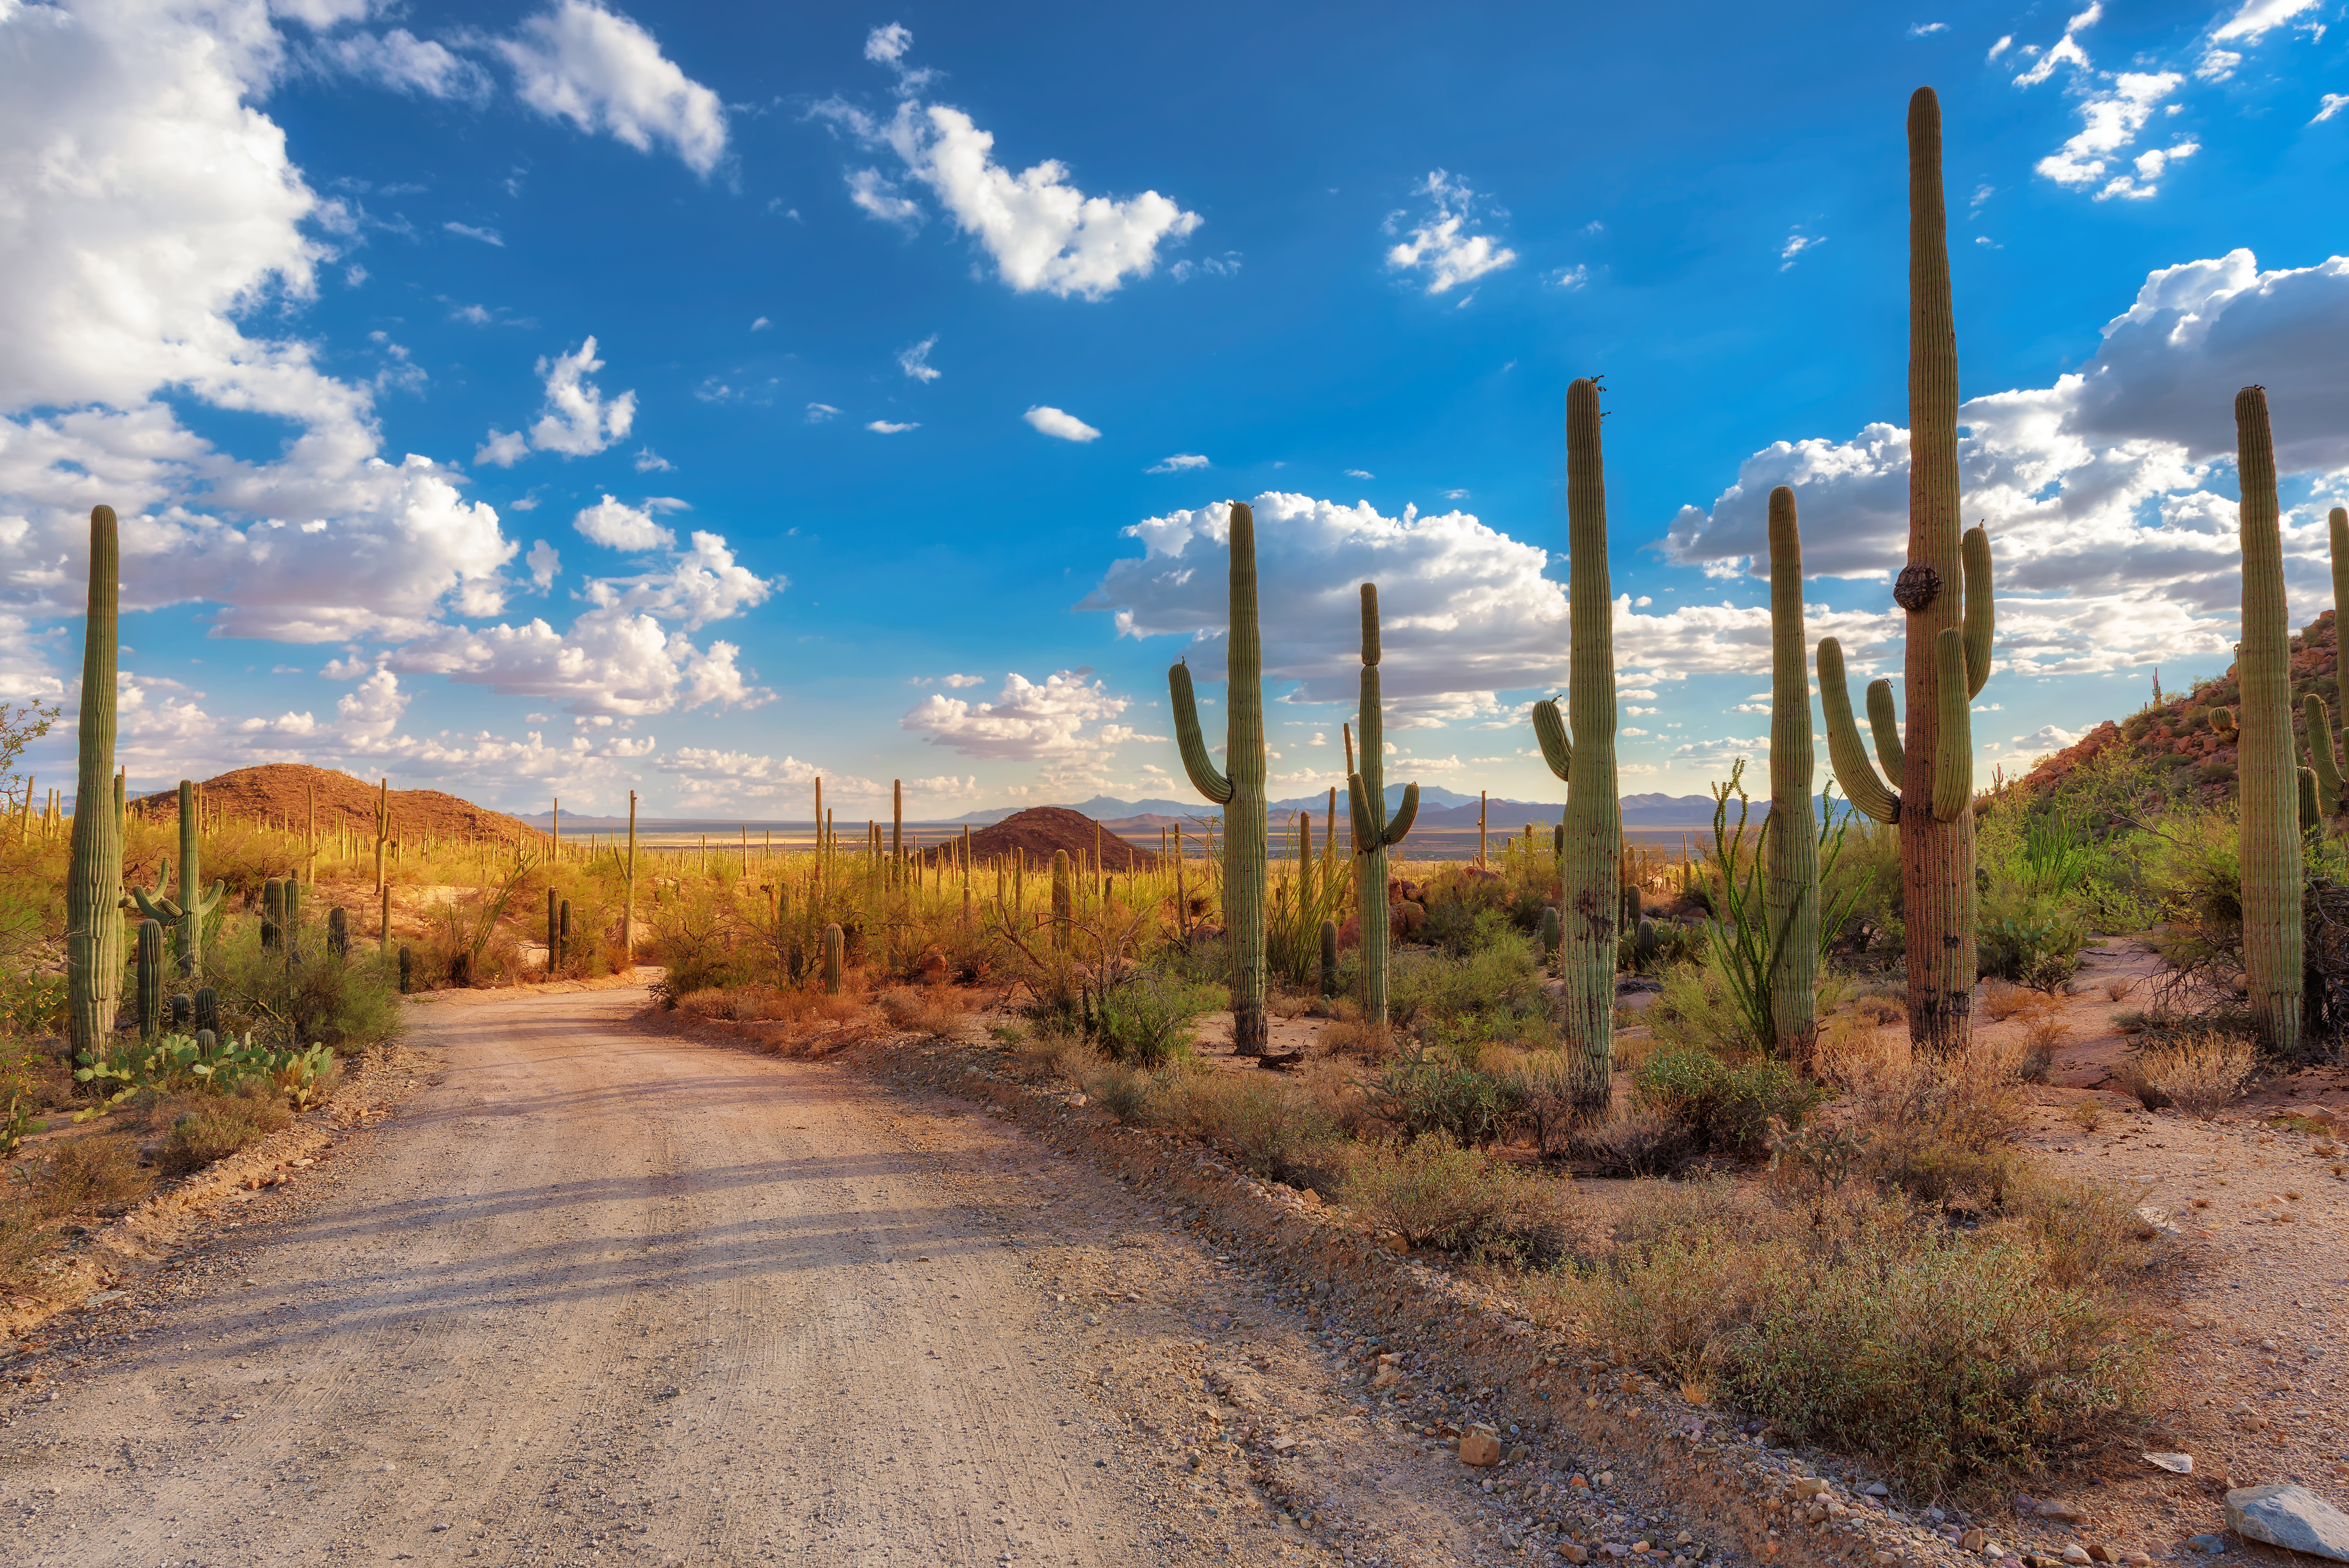 Tall-cacti-alongside-a-dirt-road.jpg?mtime=20200122163520#asset:107754